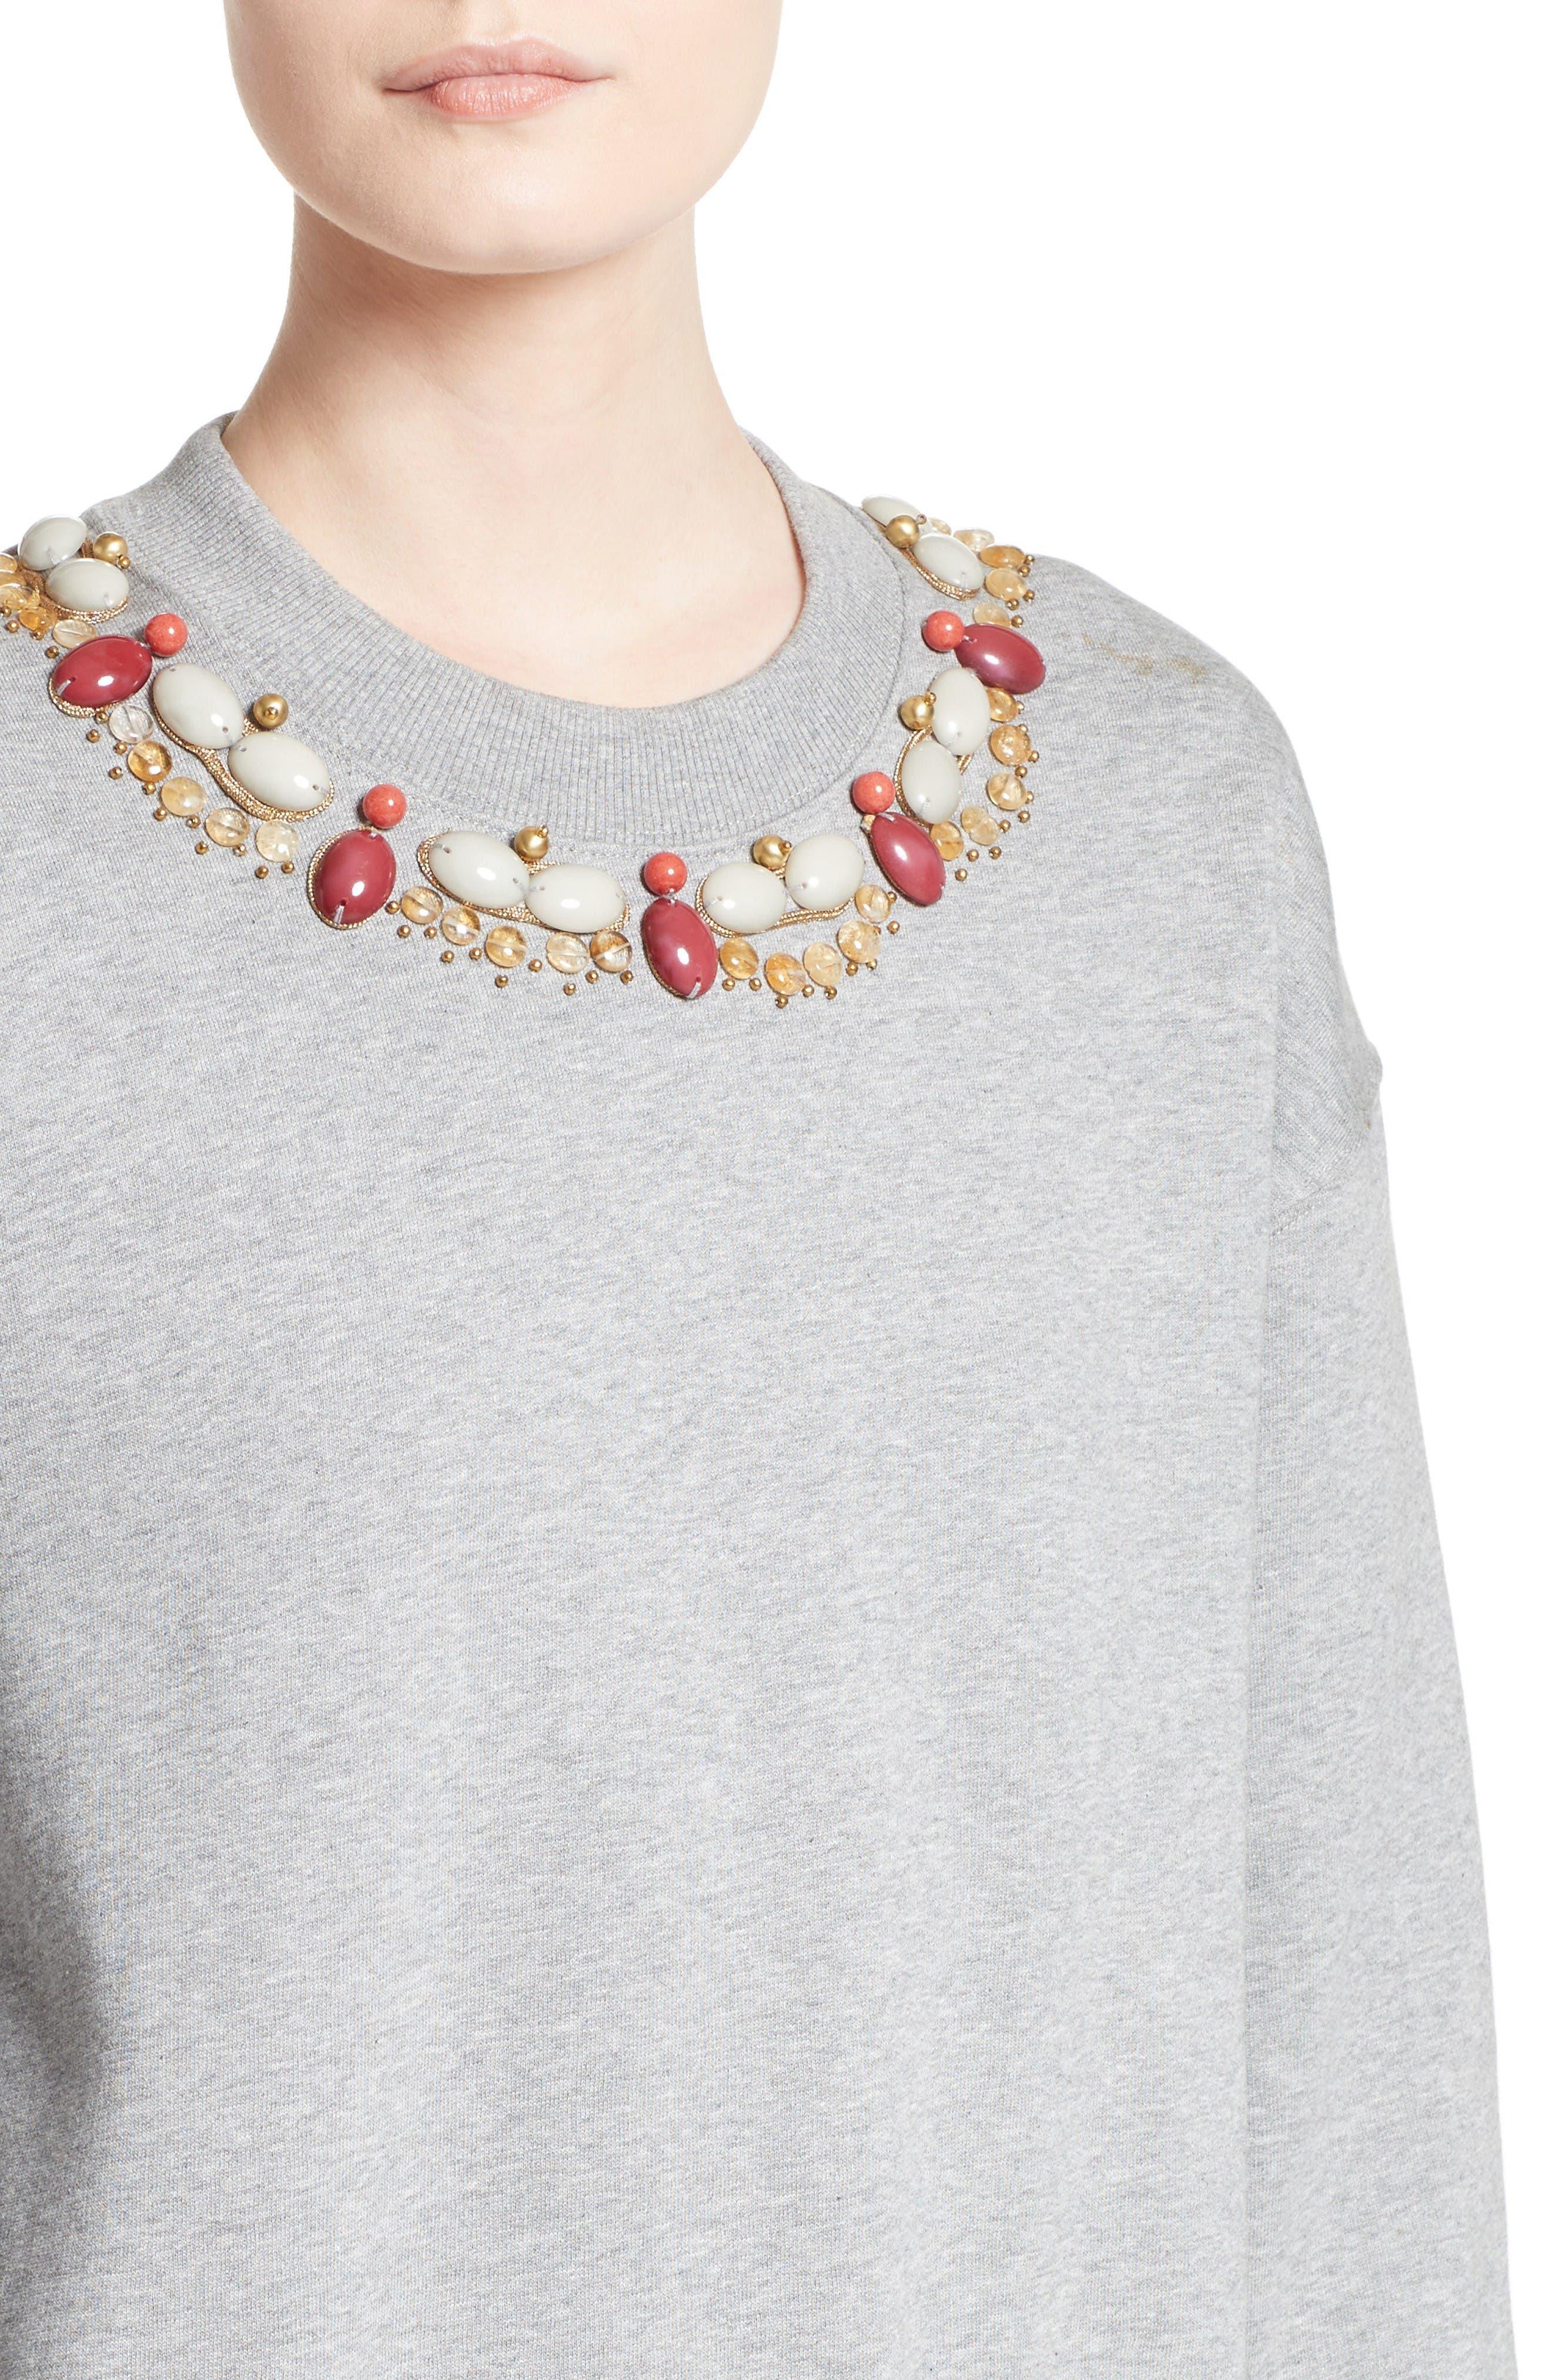 Juliano Embellished Sweatshirt,                             Alternate thumbnail 6, color,                             Pale Grey Melange